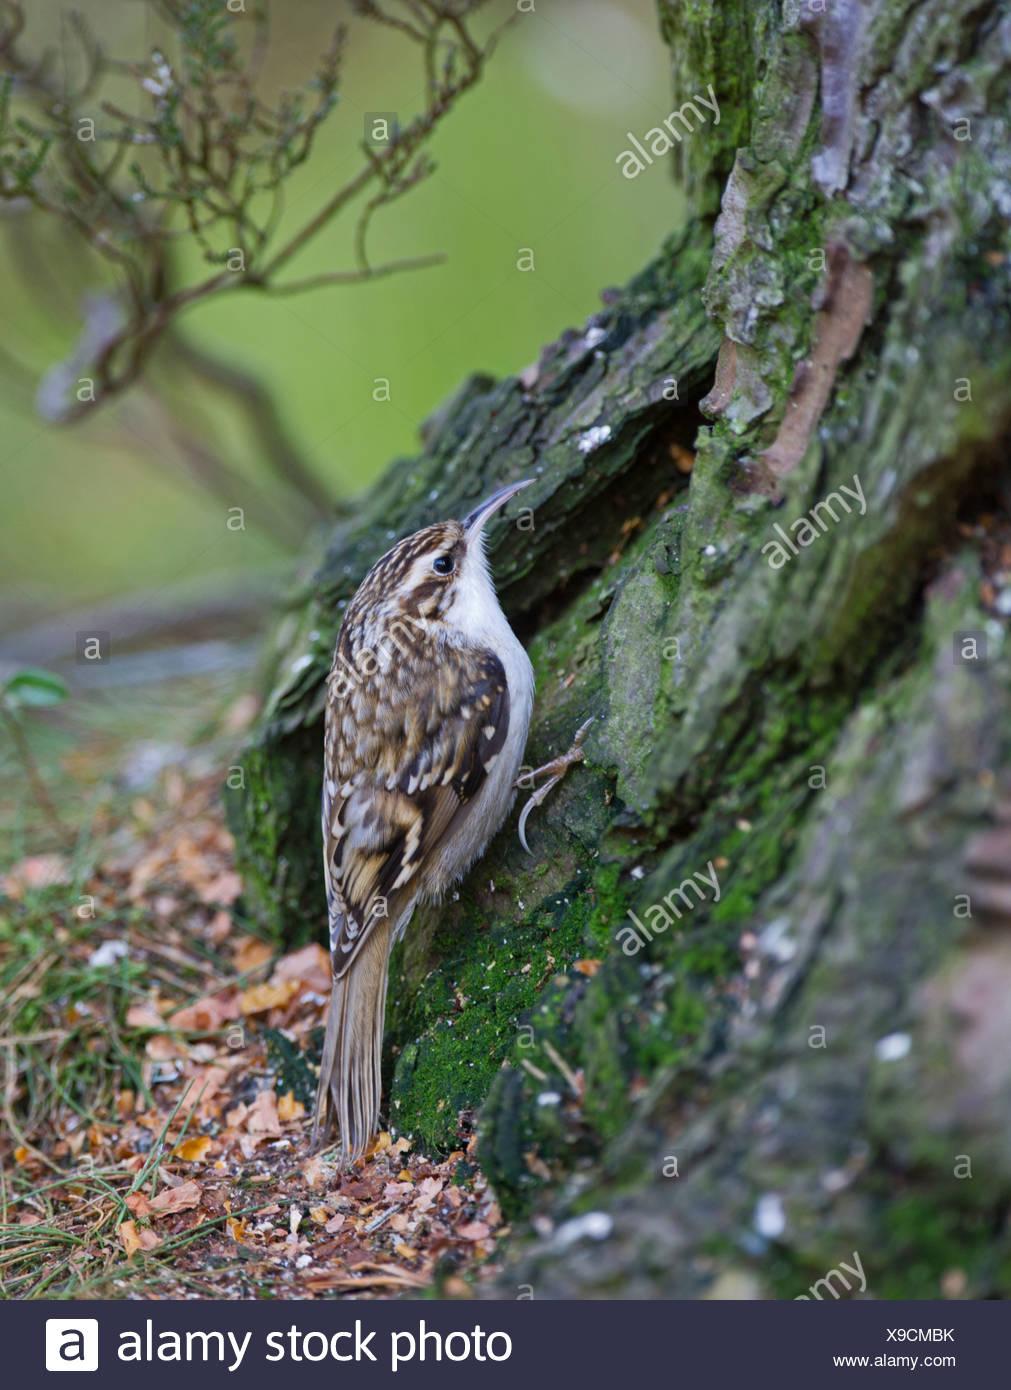 Treecreeper Certhia familiaris Scotland winter - Stock Image